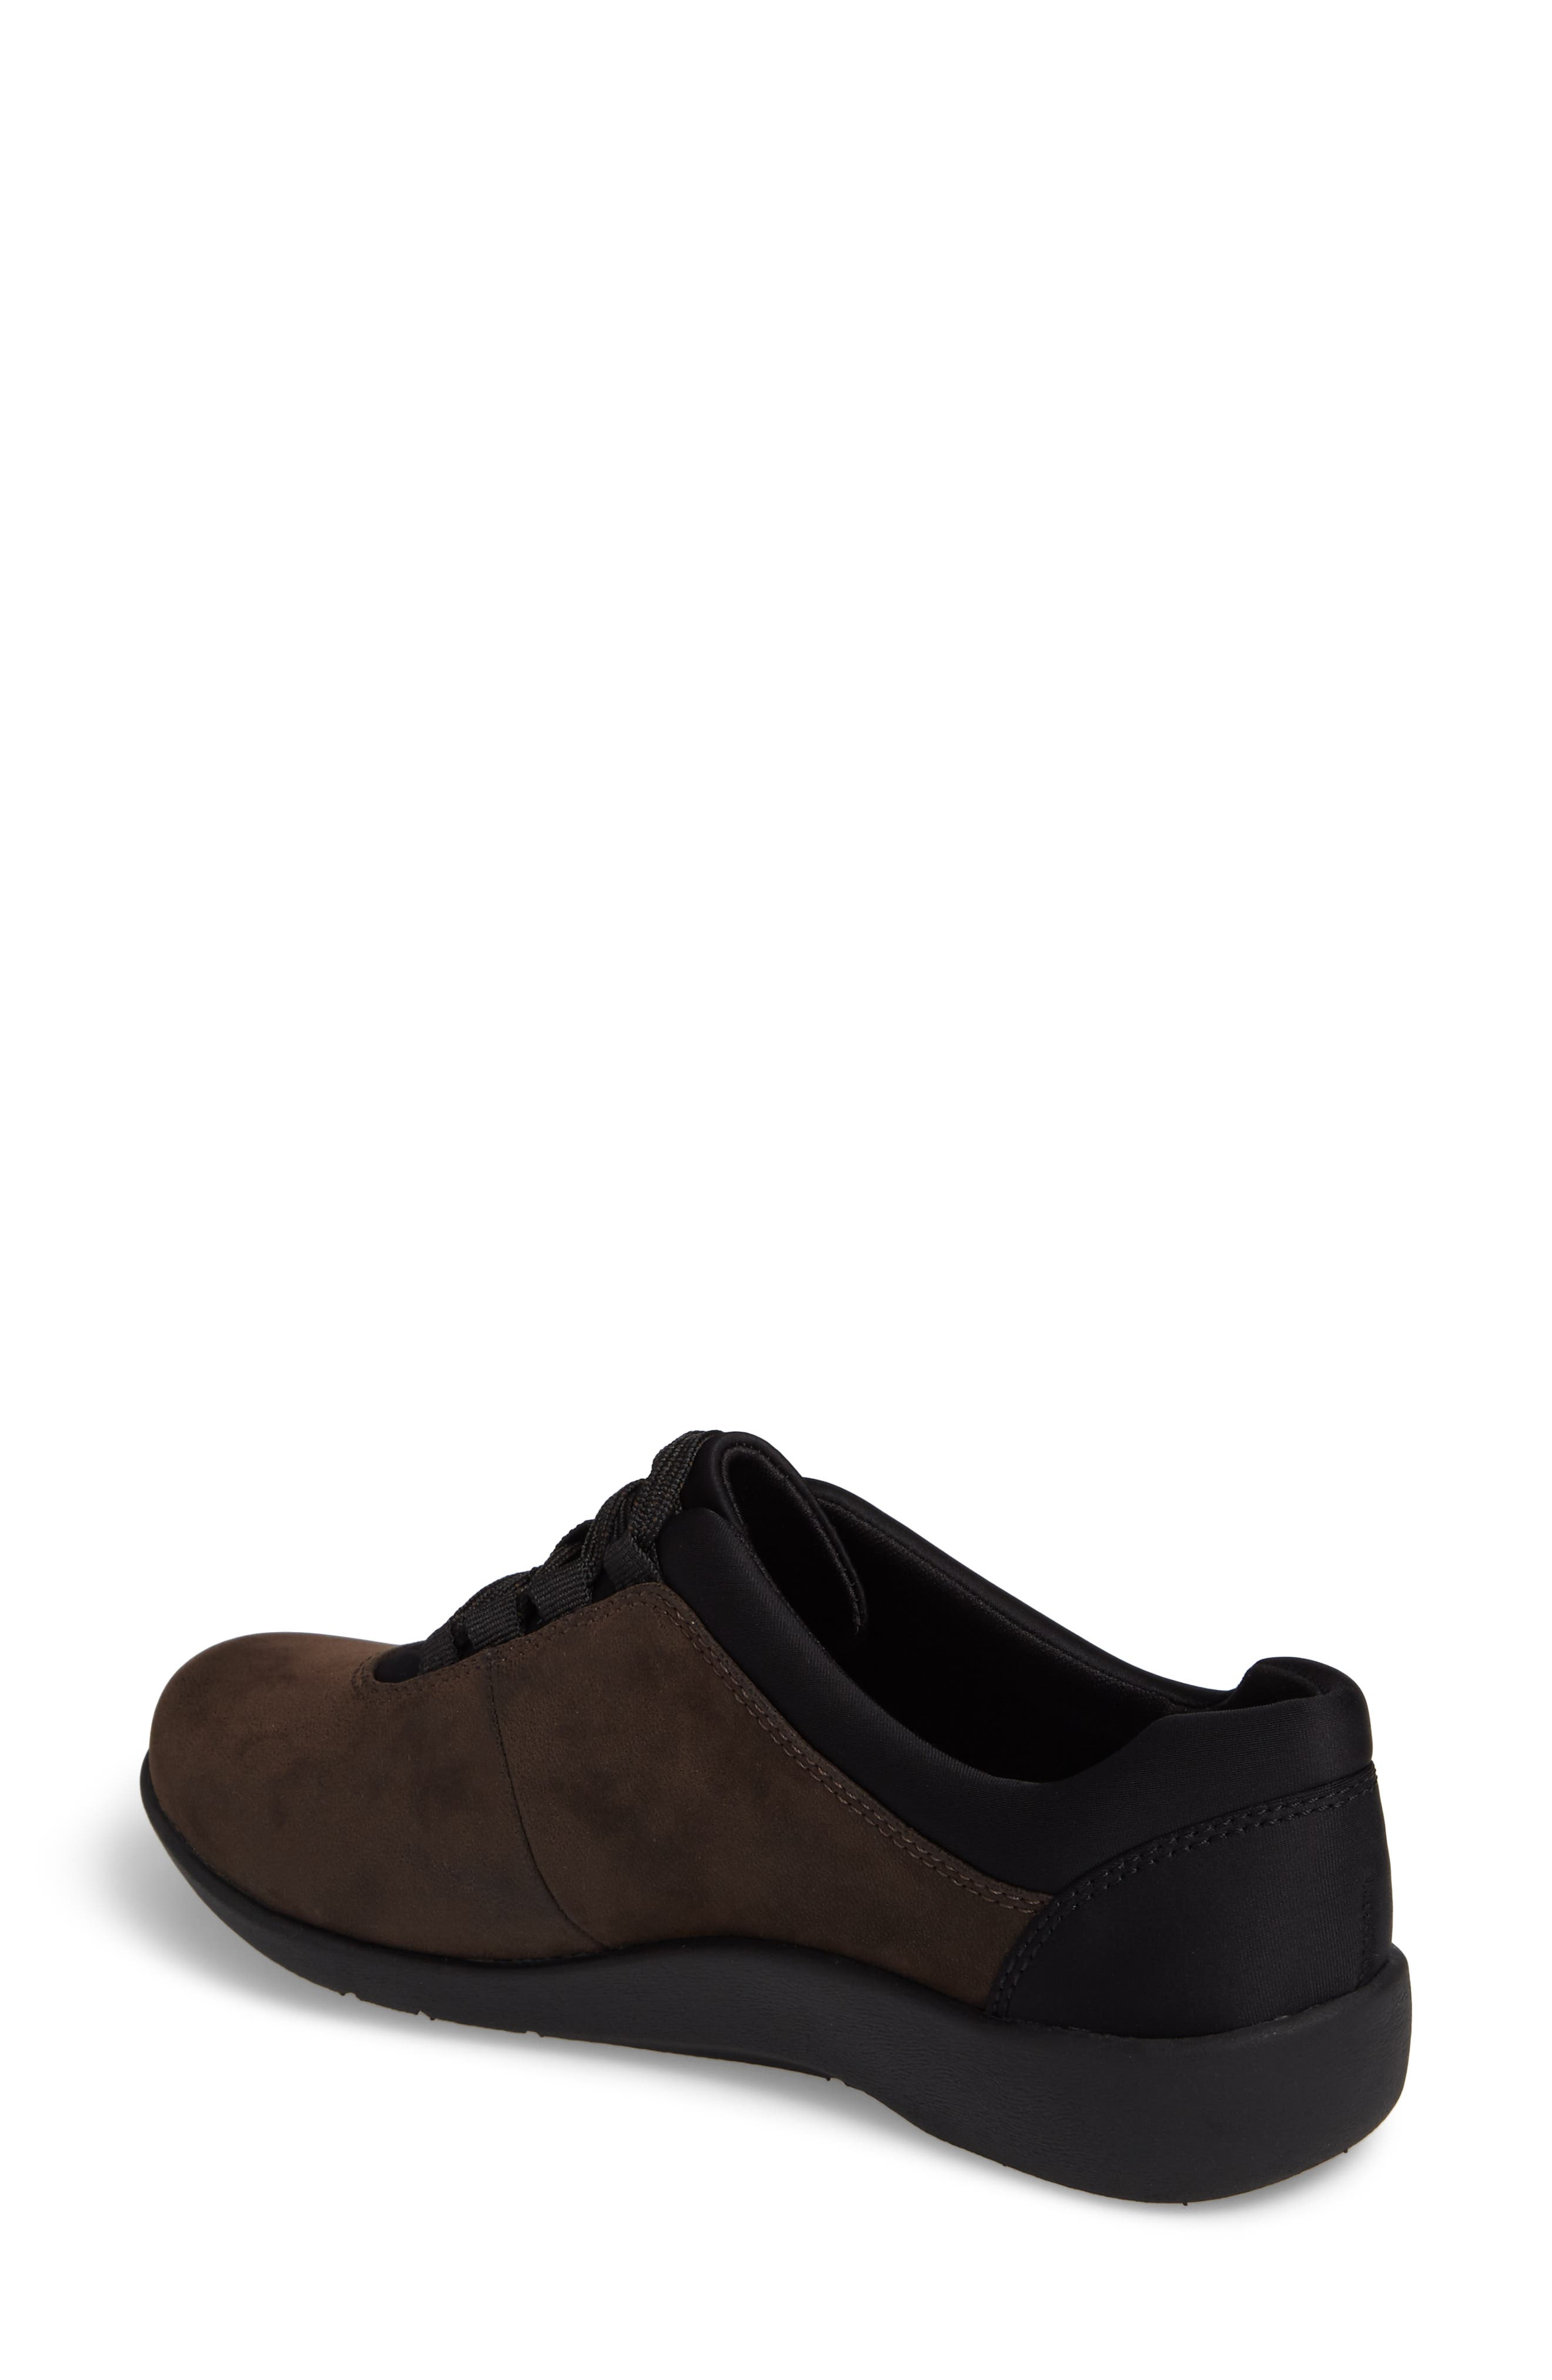 Sillian Pine Sneaker,                             Alternate thumbnail 2, color,                             BROWN CANVAS